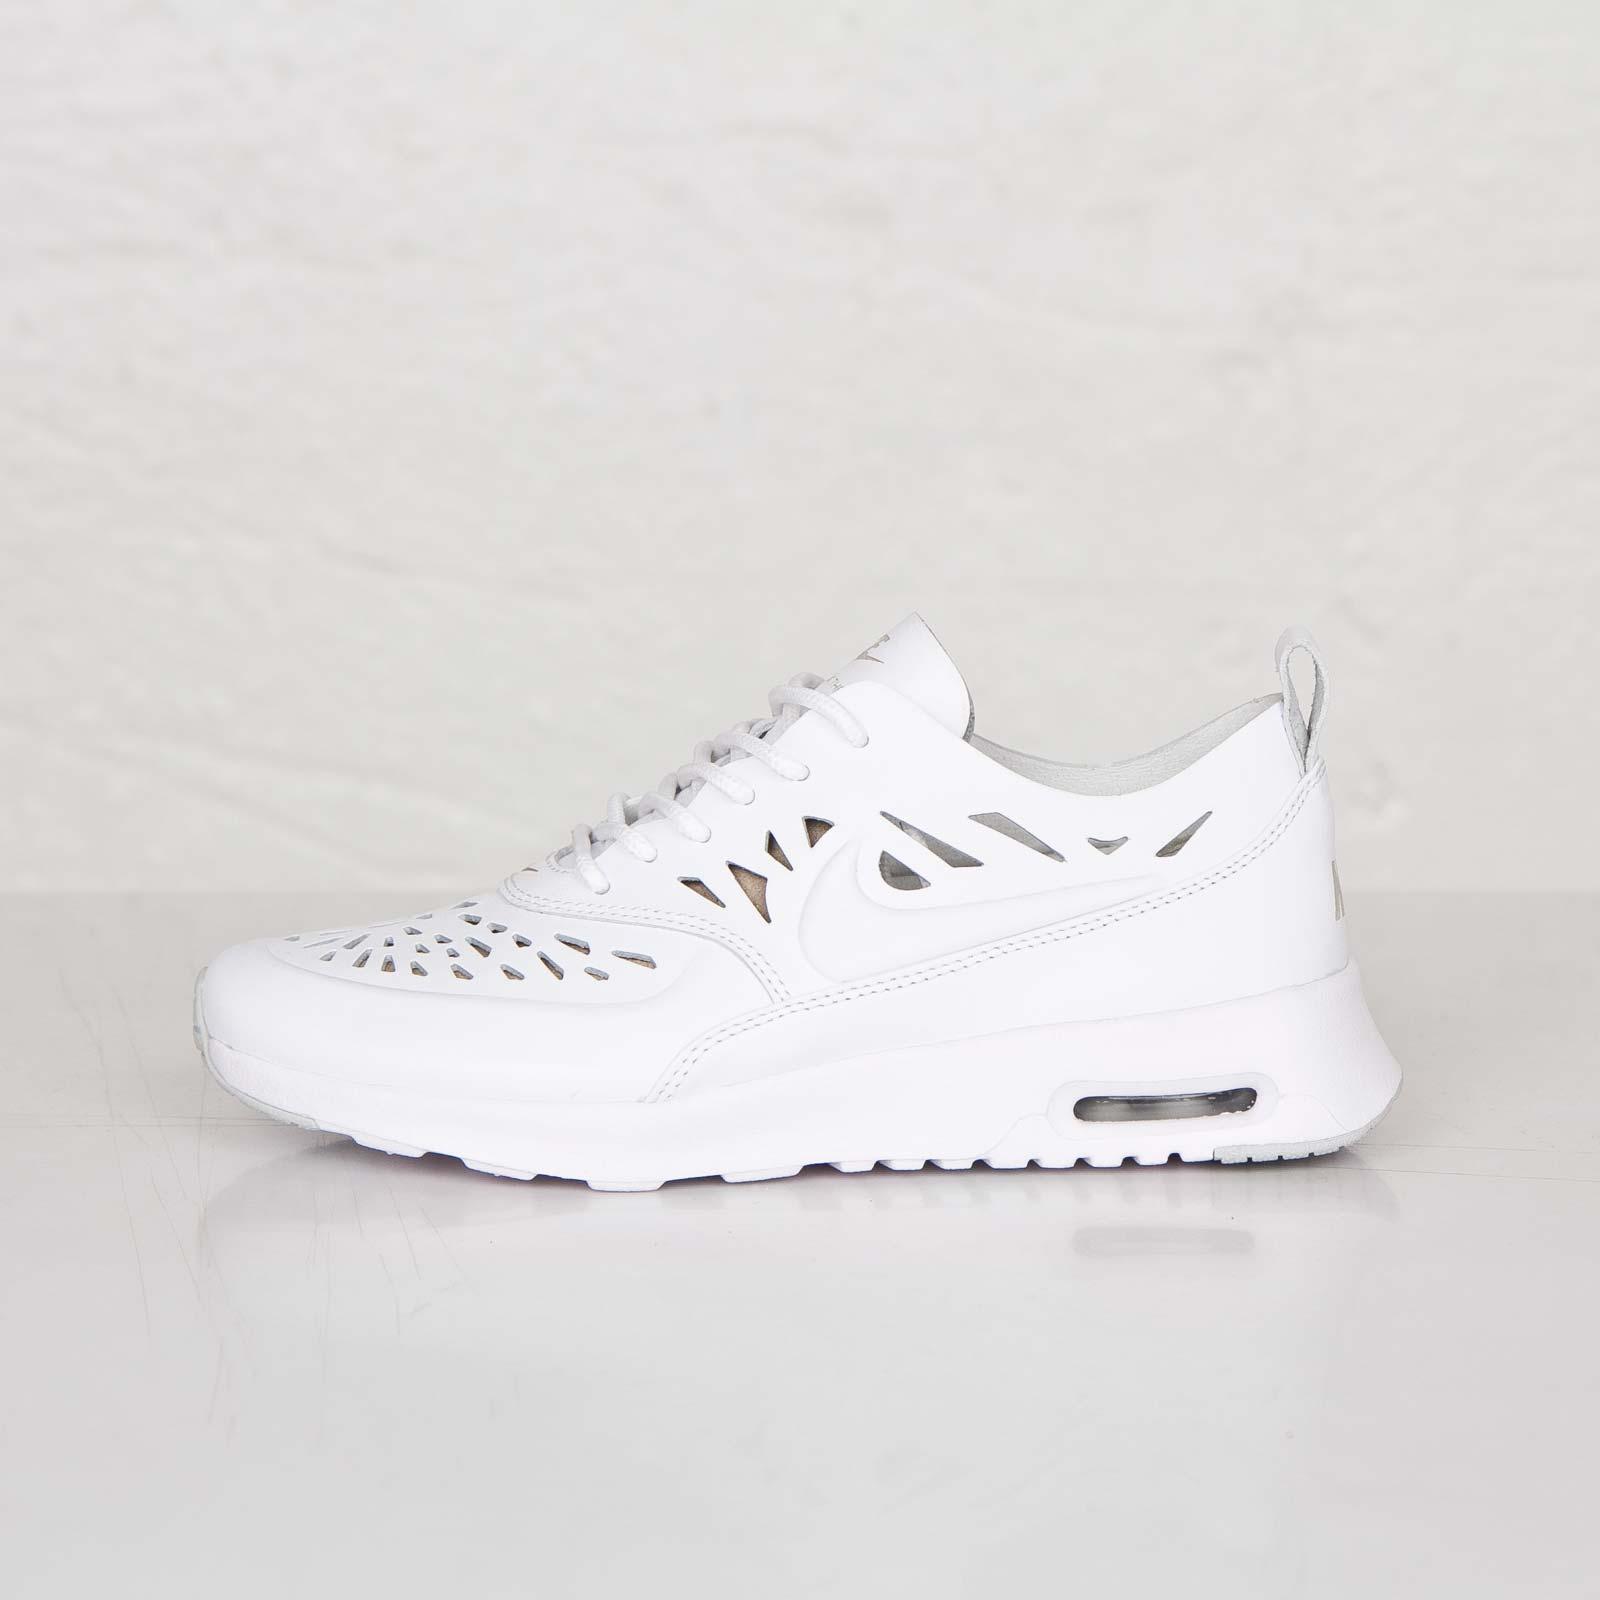 separation shoes b9d82 dc216 ... Nike W Air Max Thea Joli ...